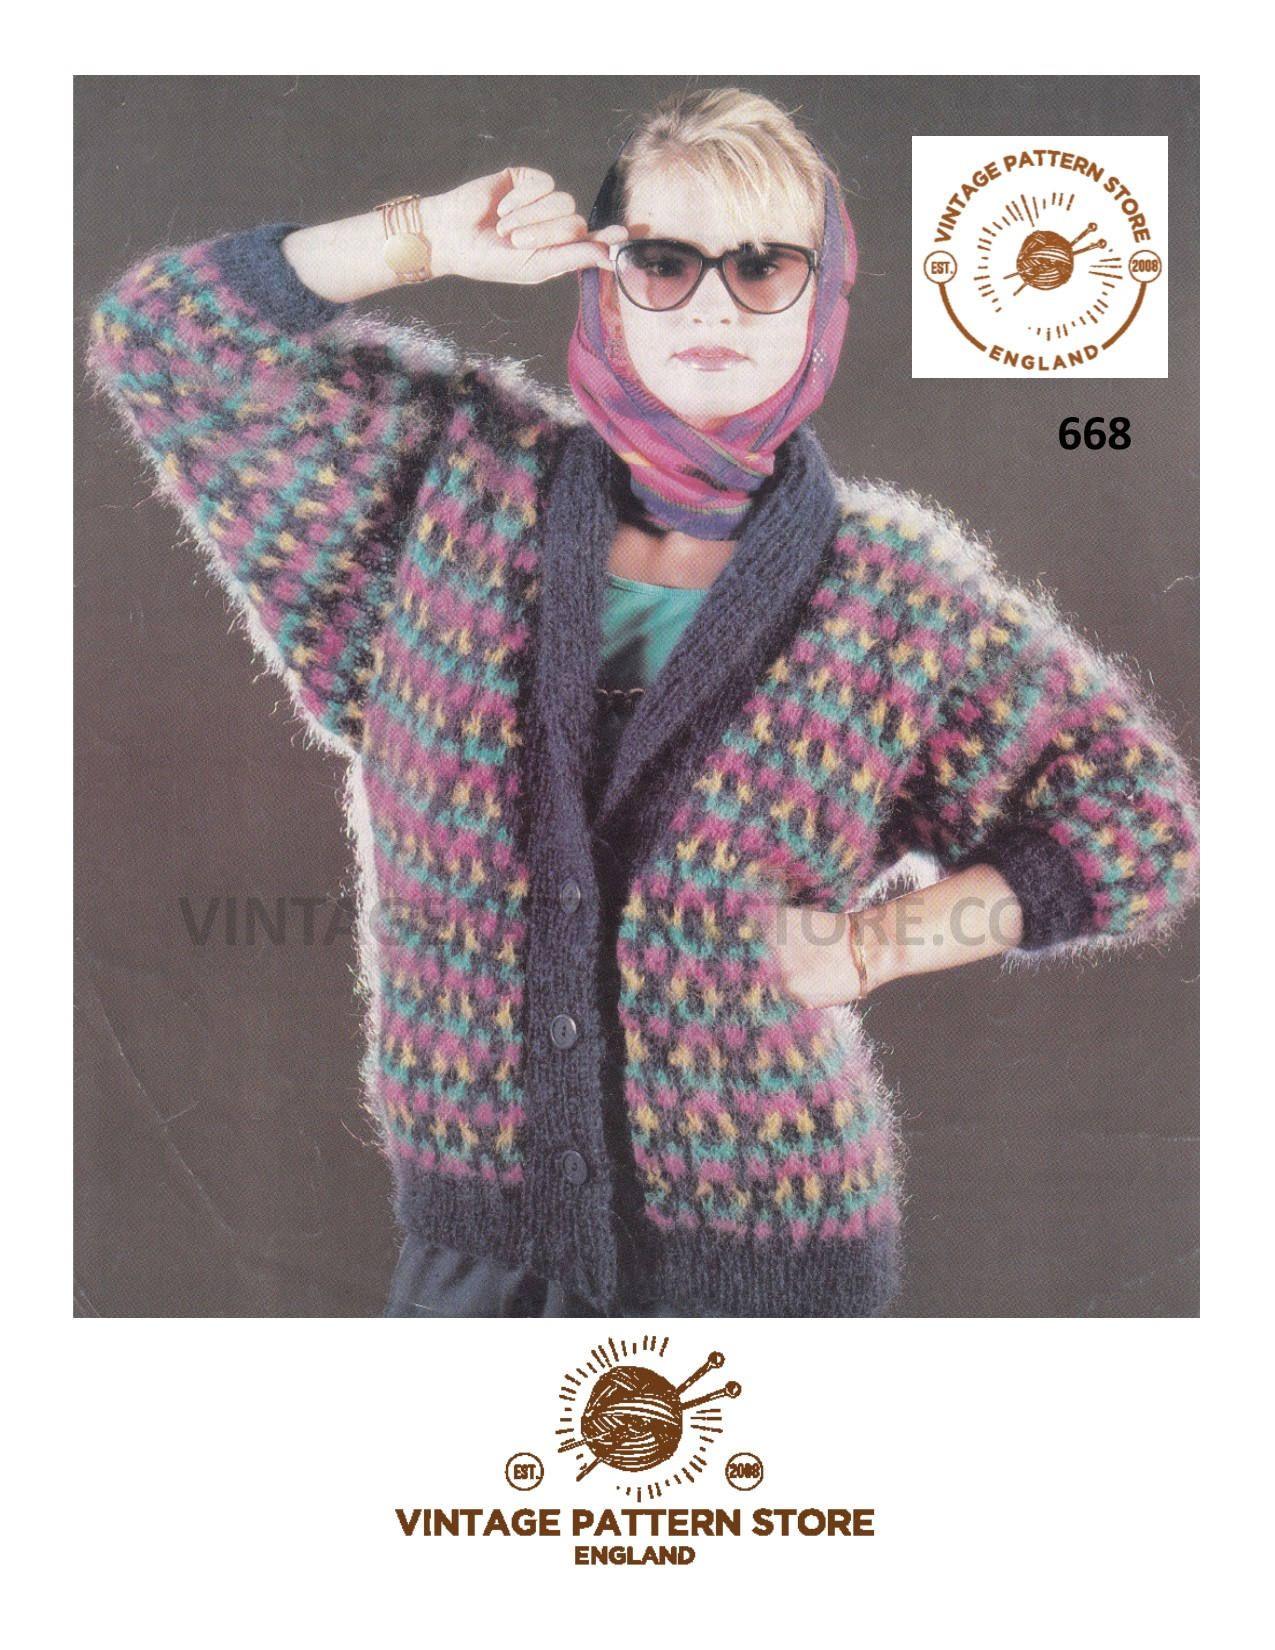 b3037a1bfe32 Ladies 90s cardigan knitting pattern